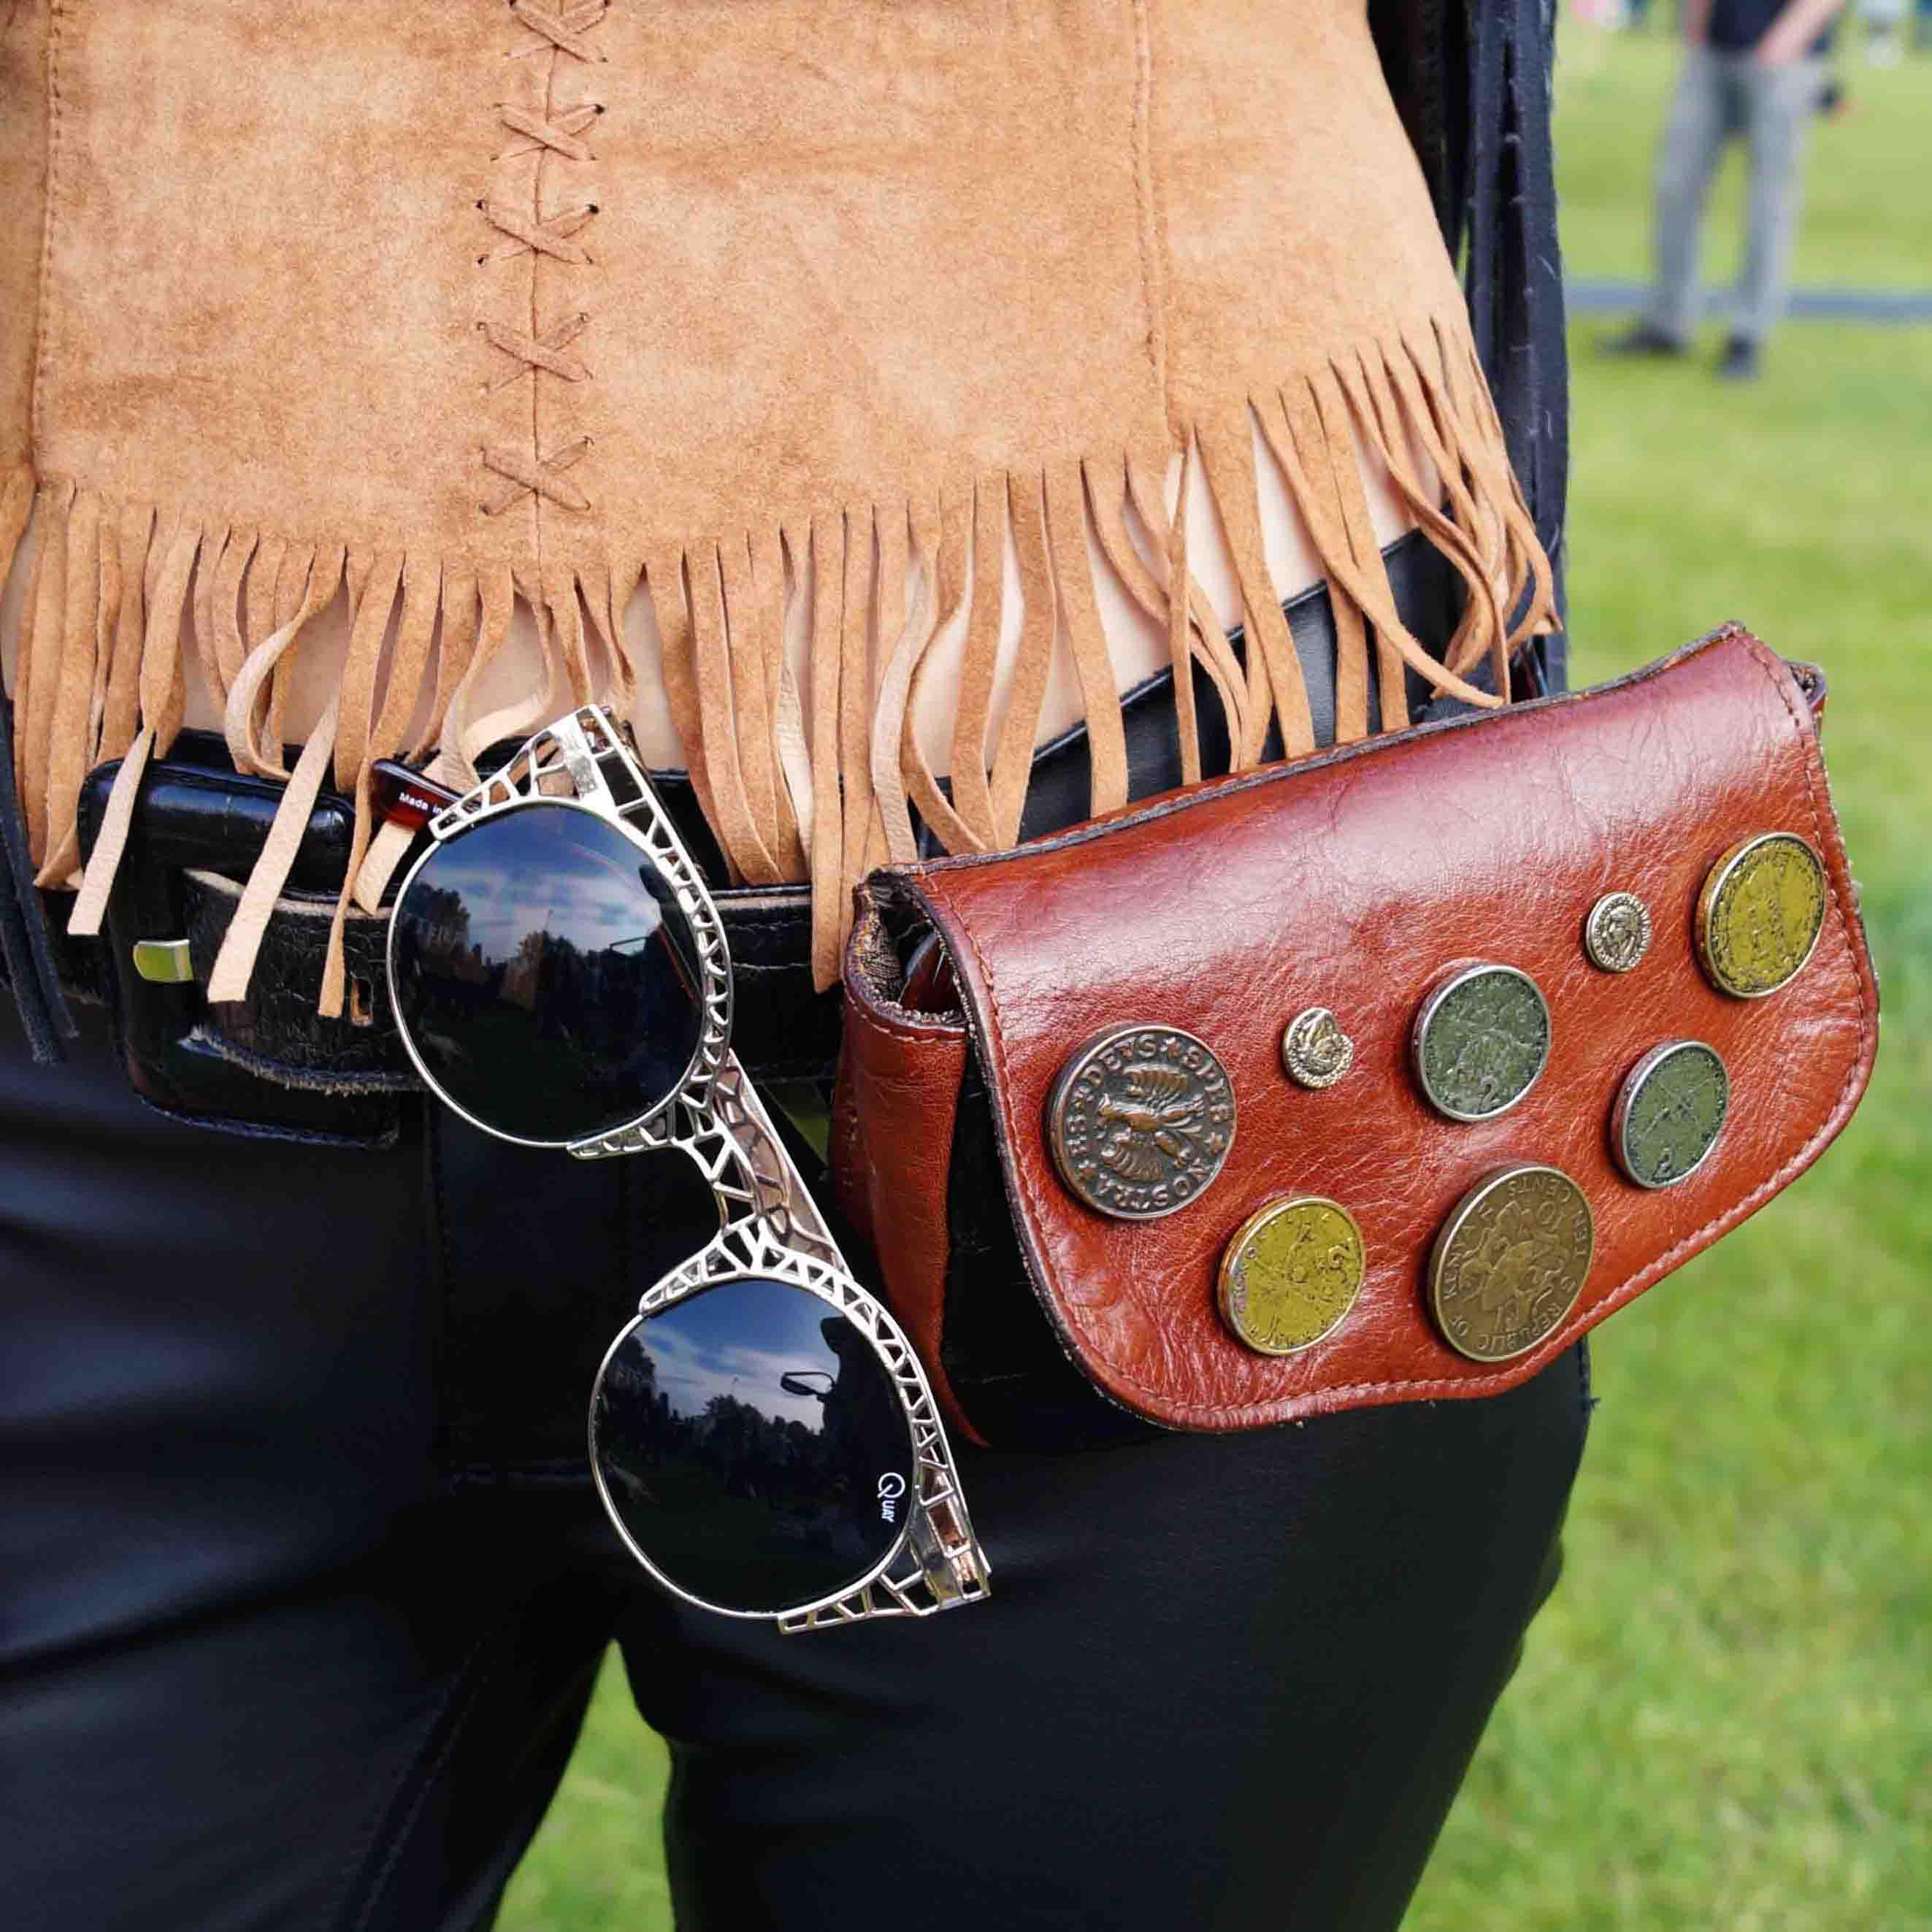 Bag at You - Fashion Blog - Fierce Fashion Festival - Leather Hipp Bag